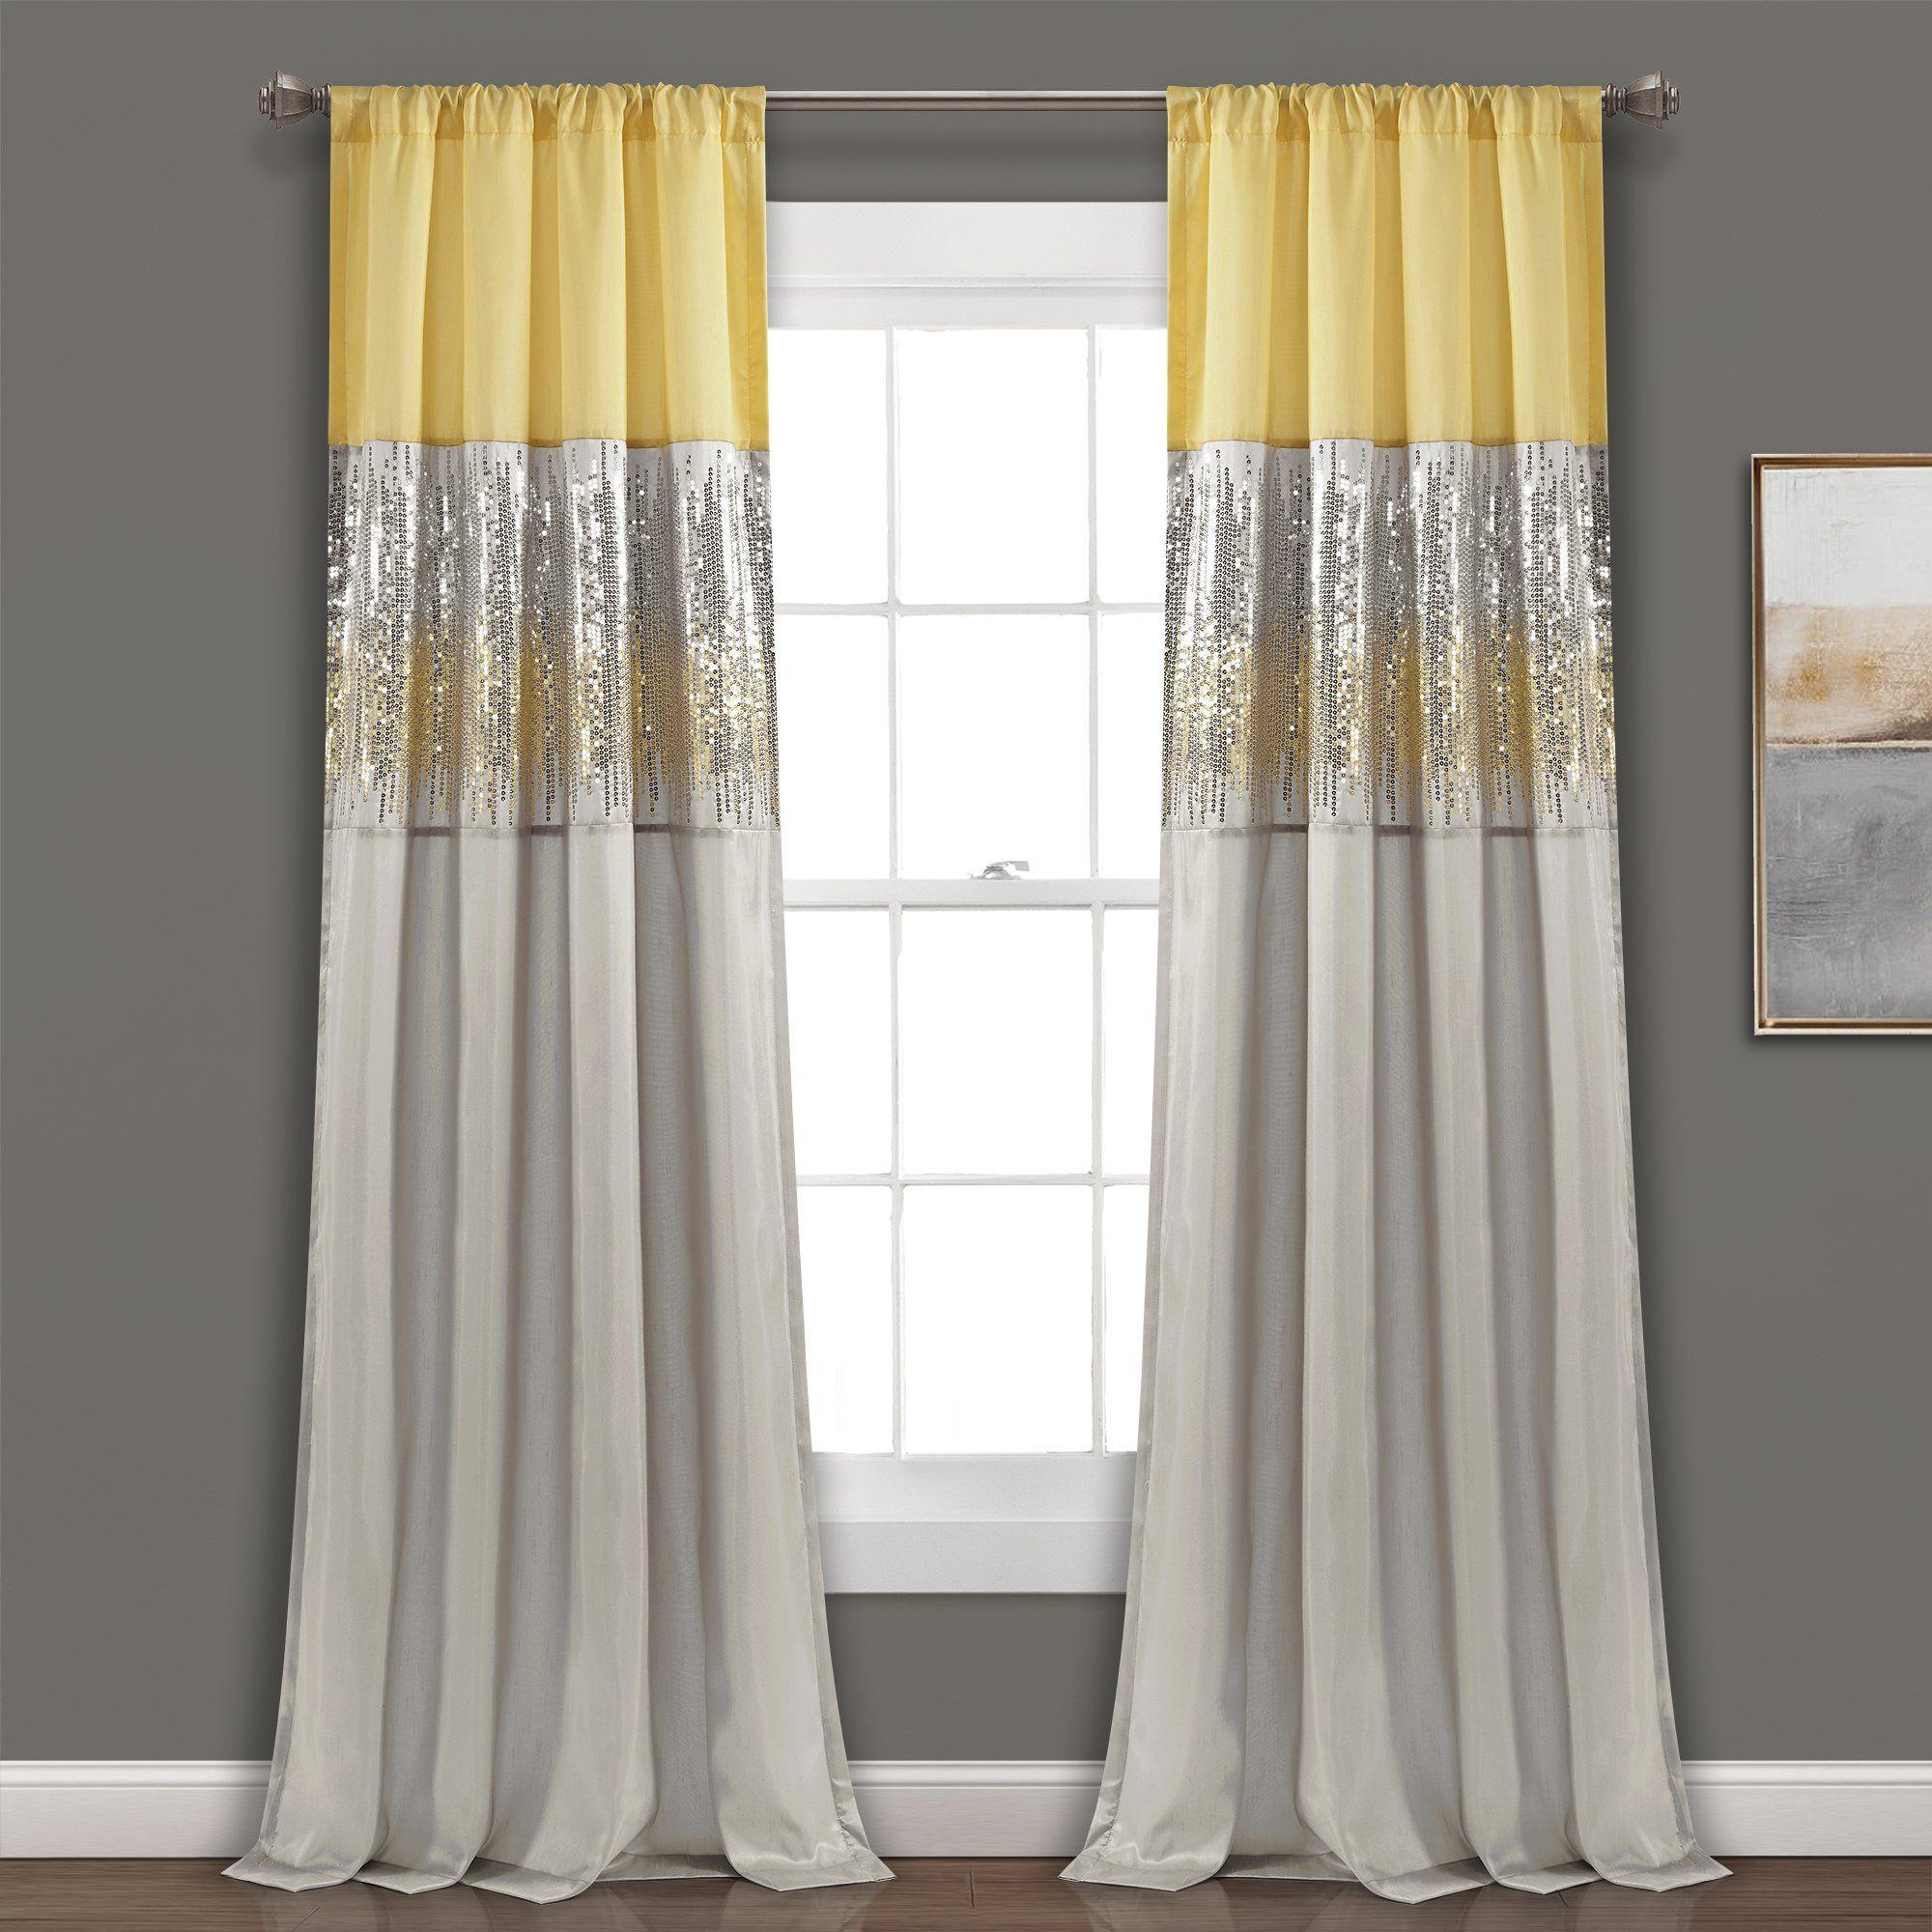 Night Sky Window Curtain Panel in 2020 | Panel curtains ...